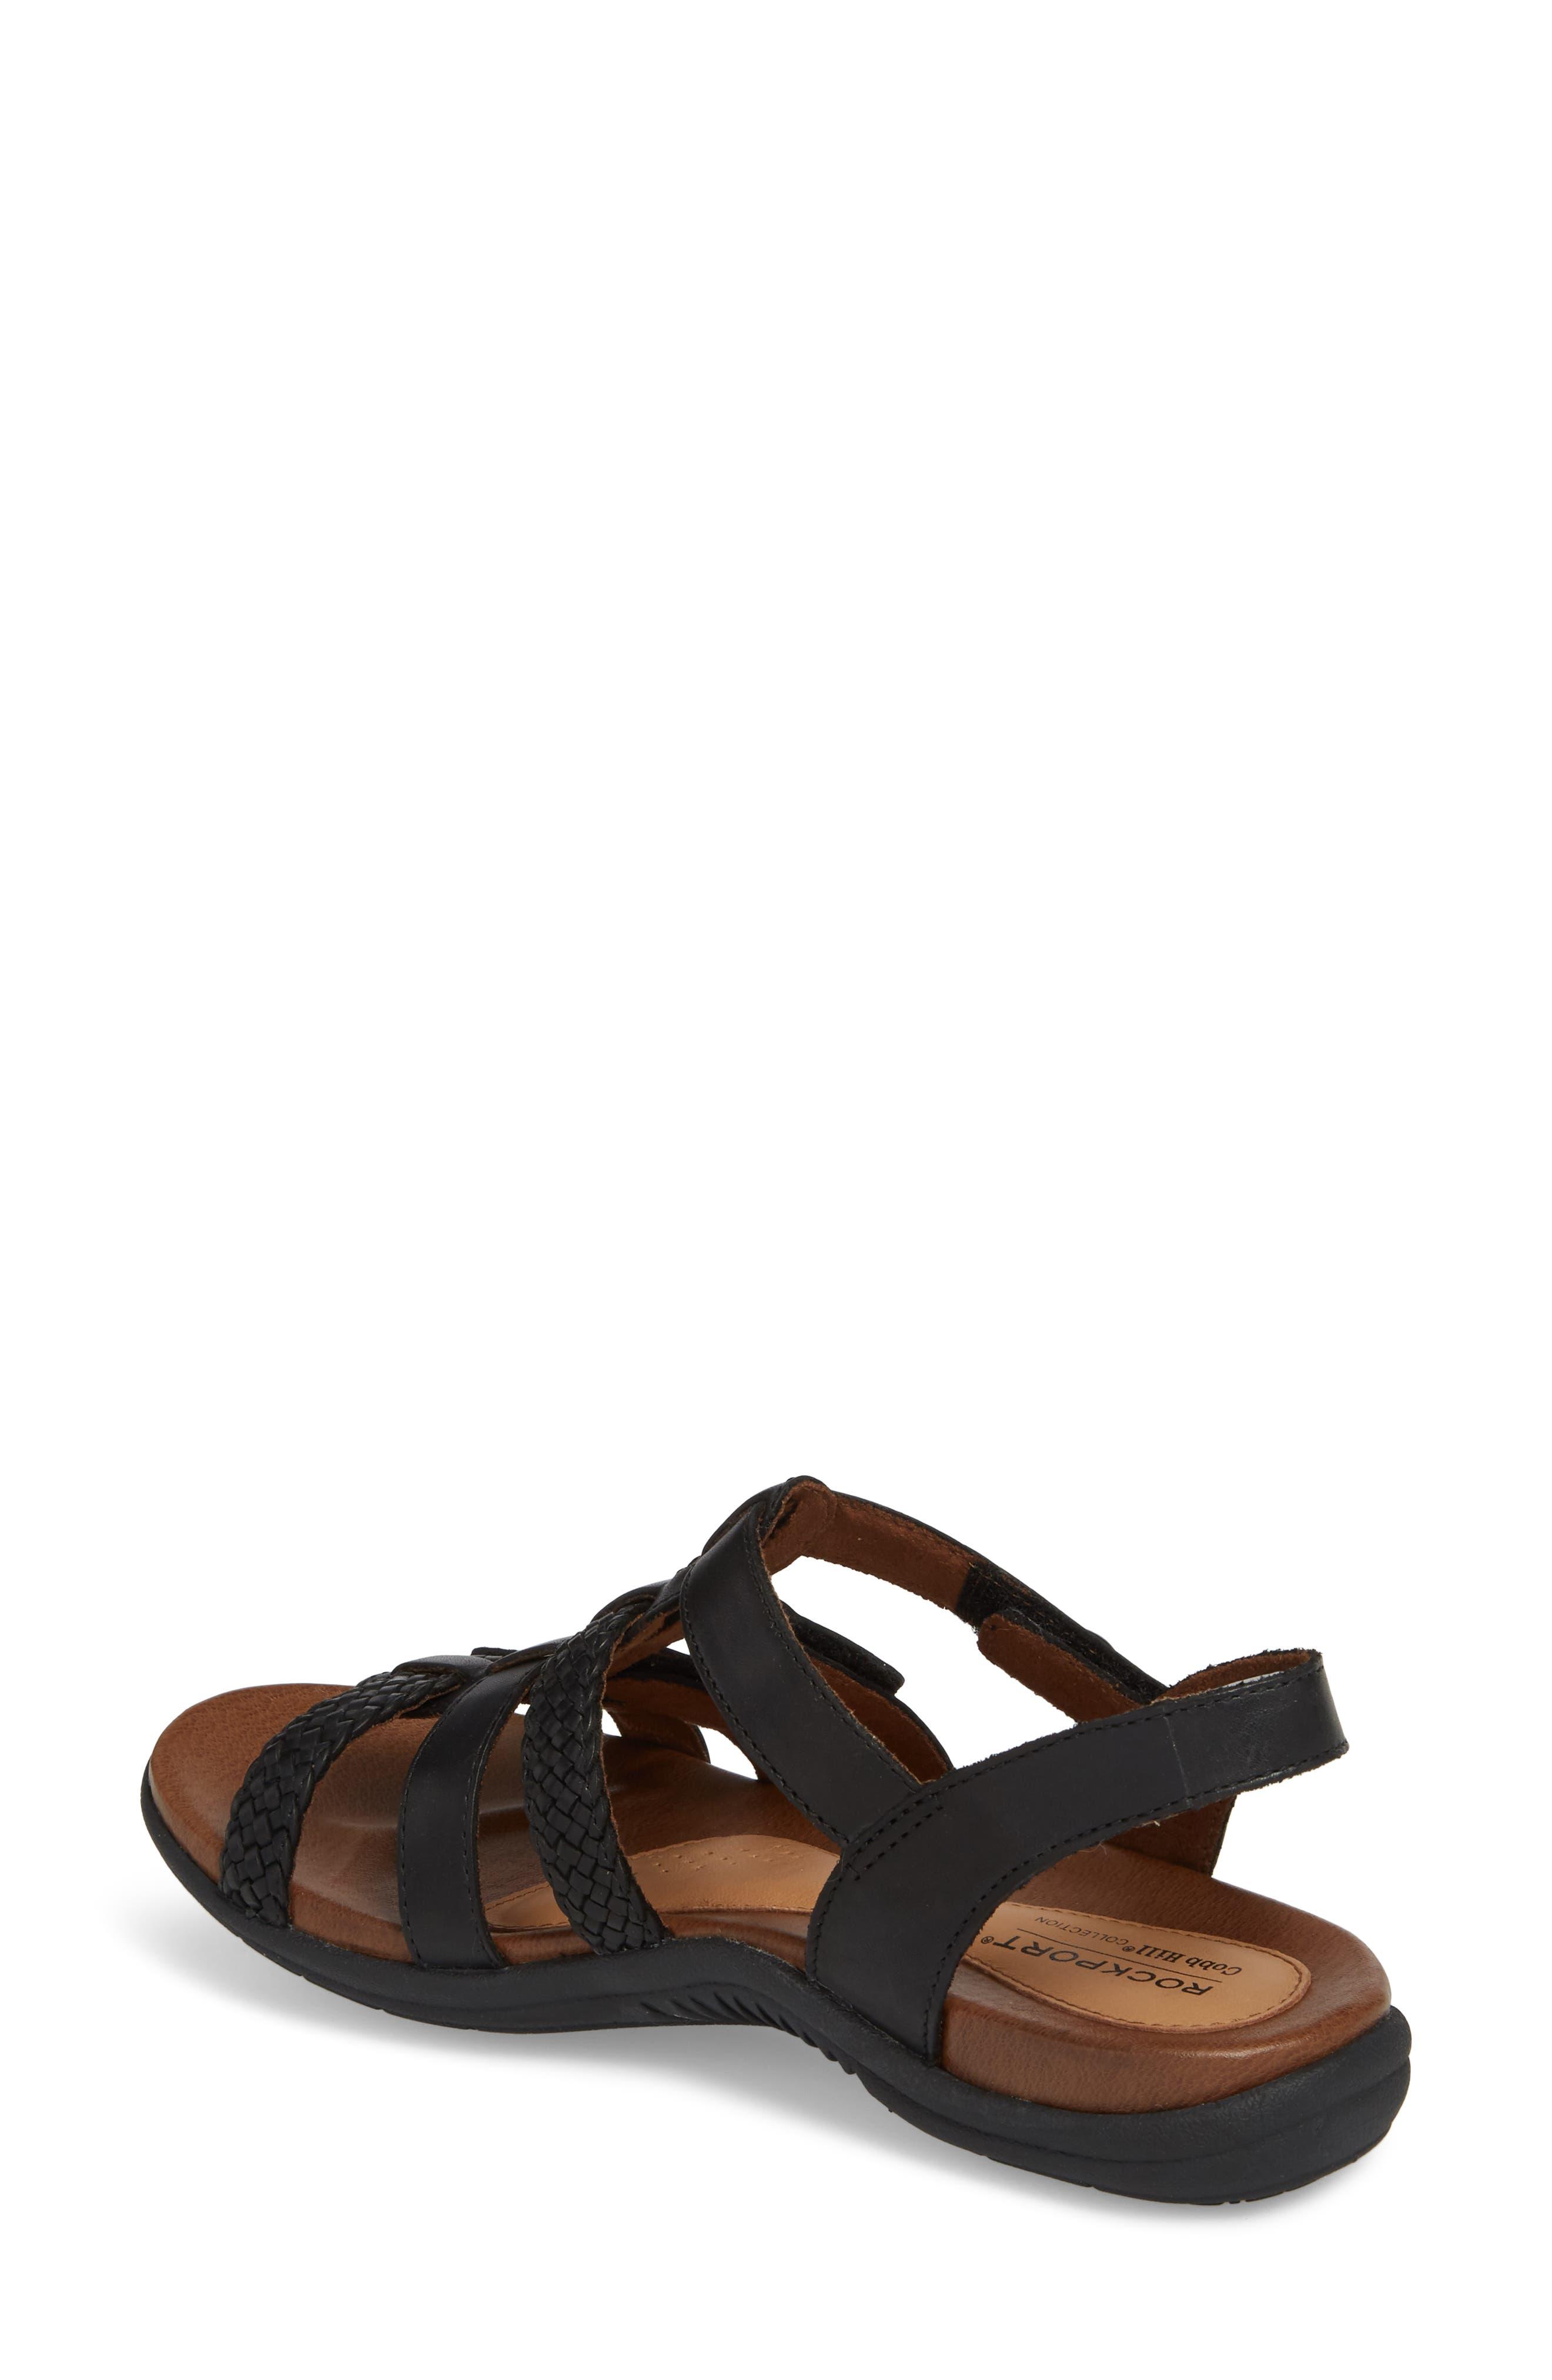 Rubey T-Strap Sandal,                             Alternate thumbnail 2, color,                             BLACK LEATHER